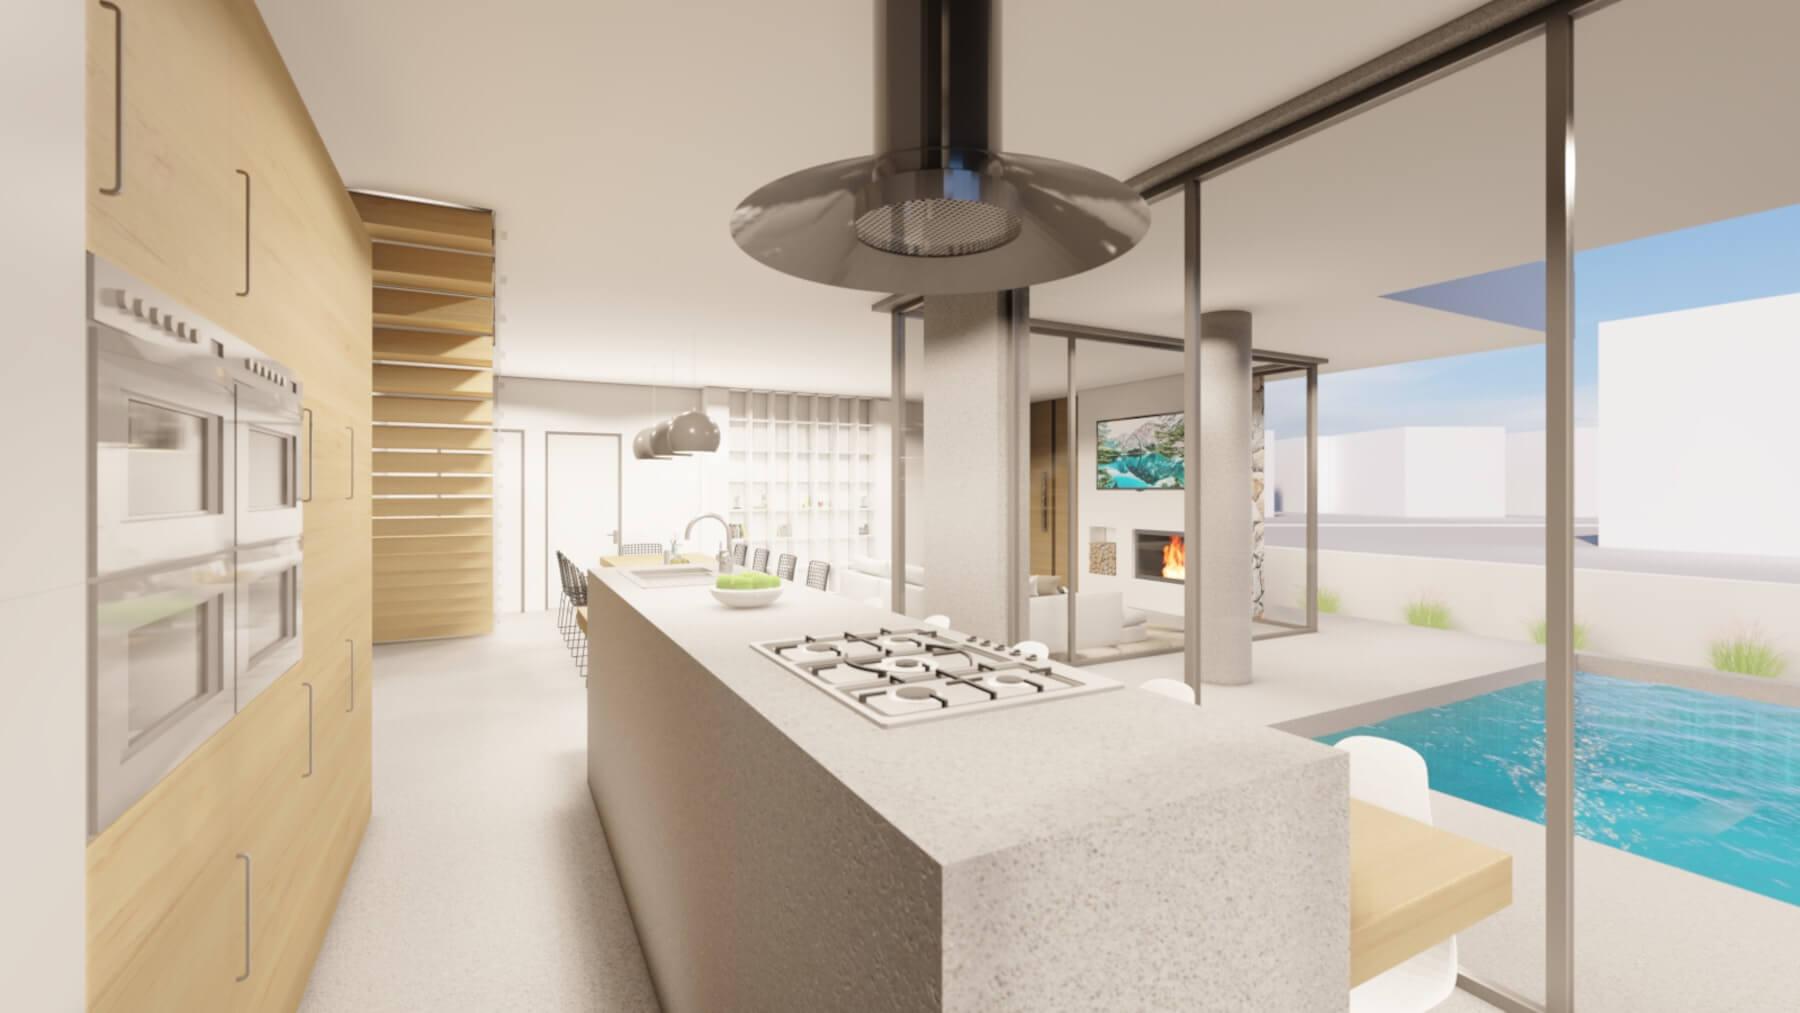 Private-residence-in-Ormidia-kitchen-interior-design